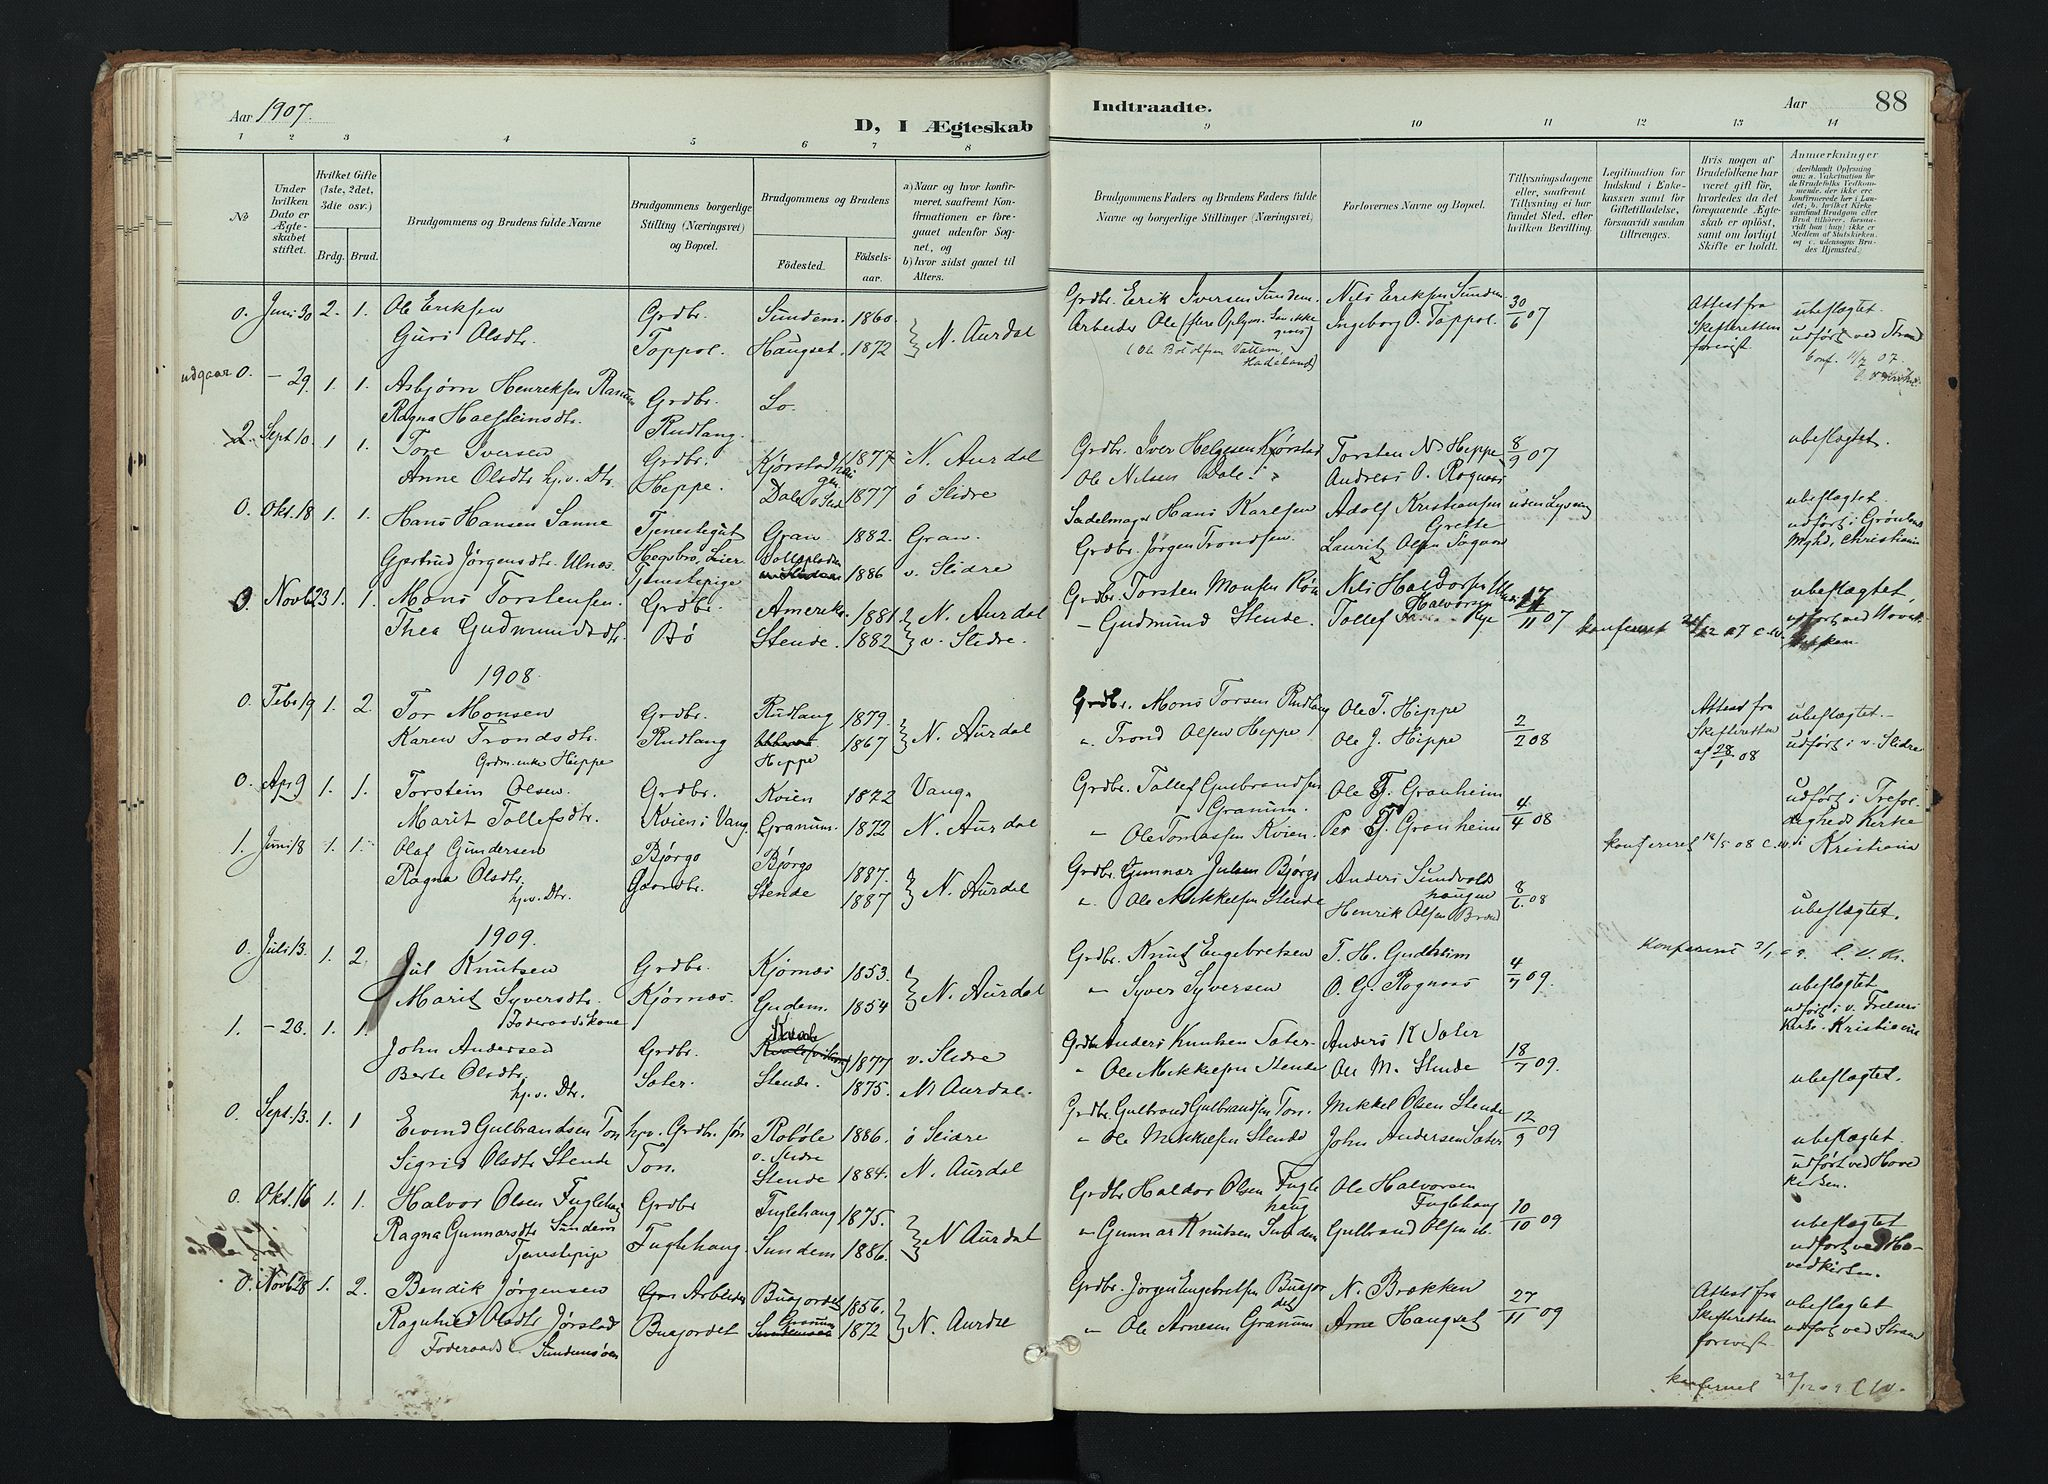 SAH, Nord-Aurdal prestekontor, Ministerialbok nr. 17, 1897-1926, s. 88